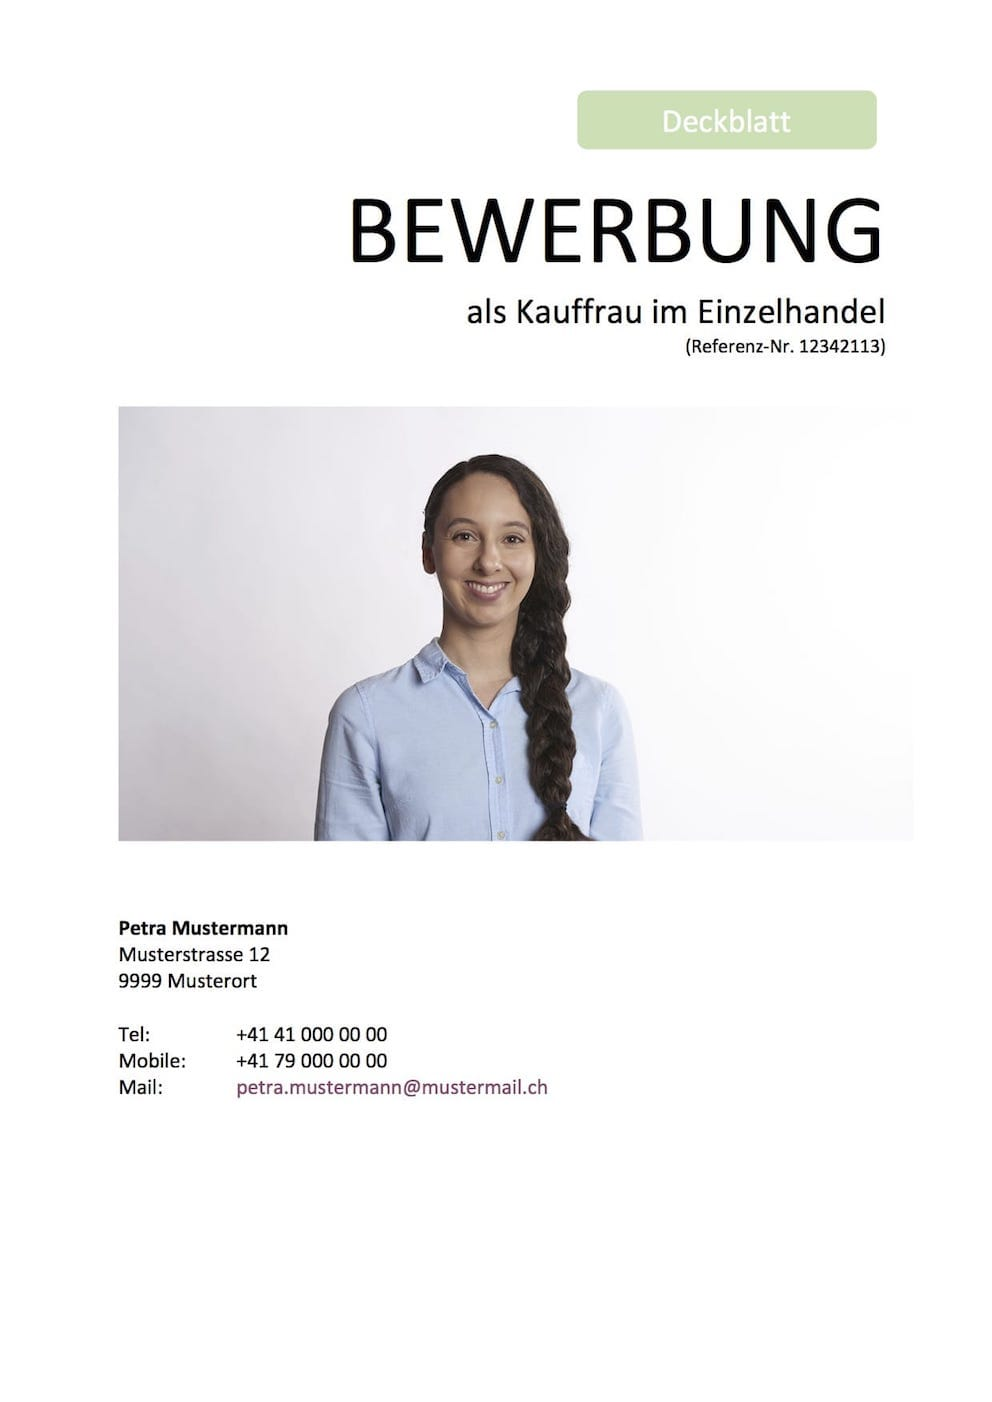 deckblatt titelblatt bewerbung vorlage - Deckblatt Lebenslauf